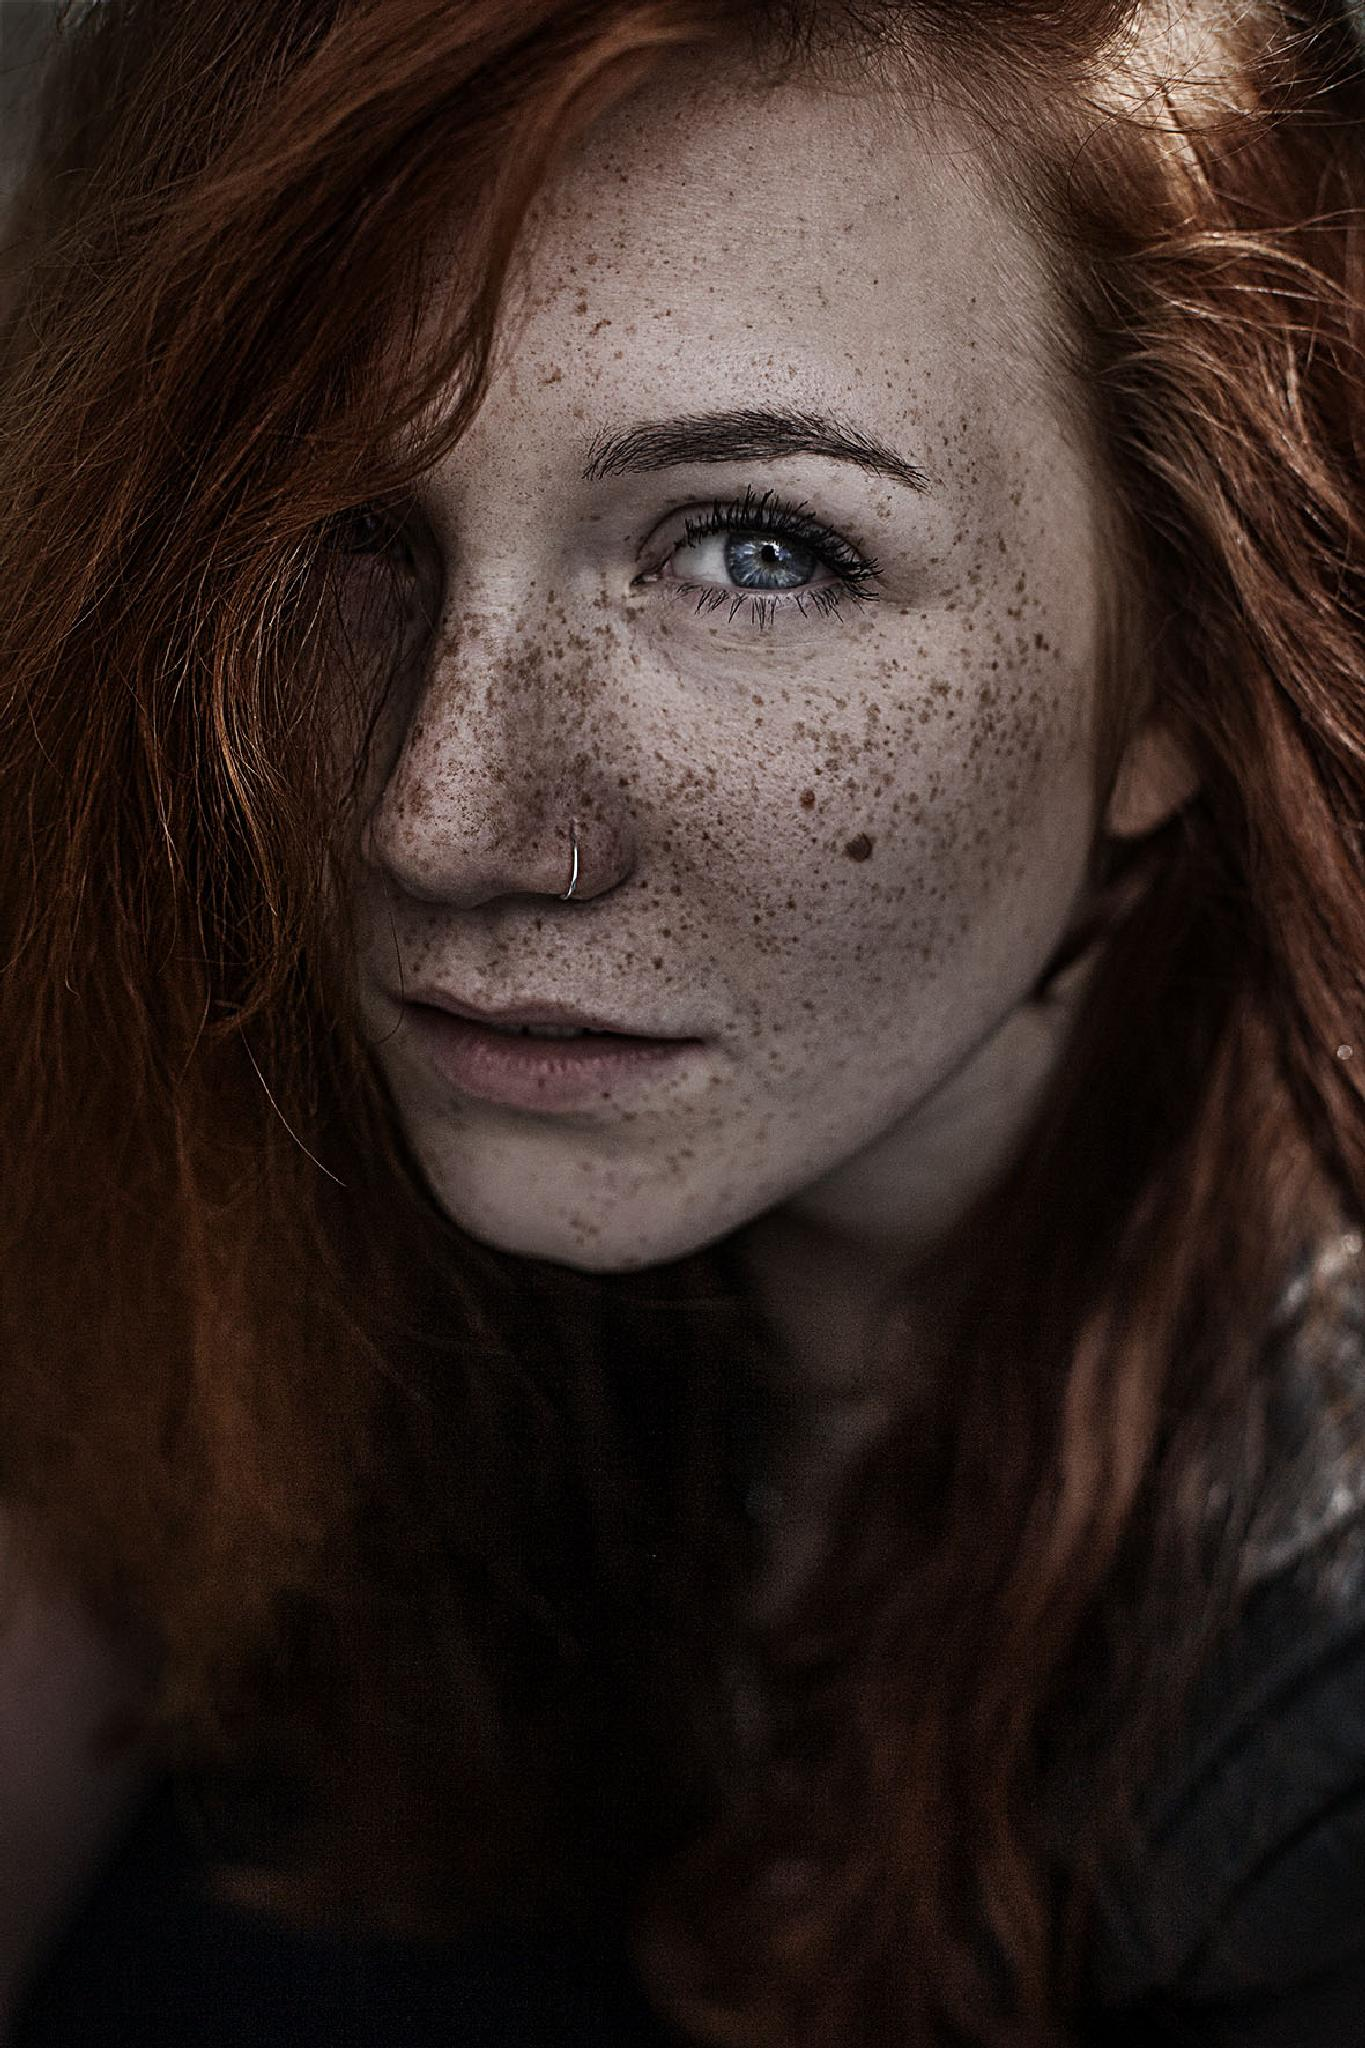 Anna by Caro2.0